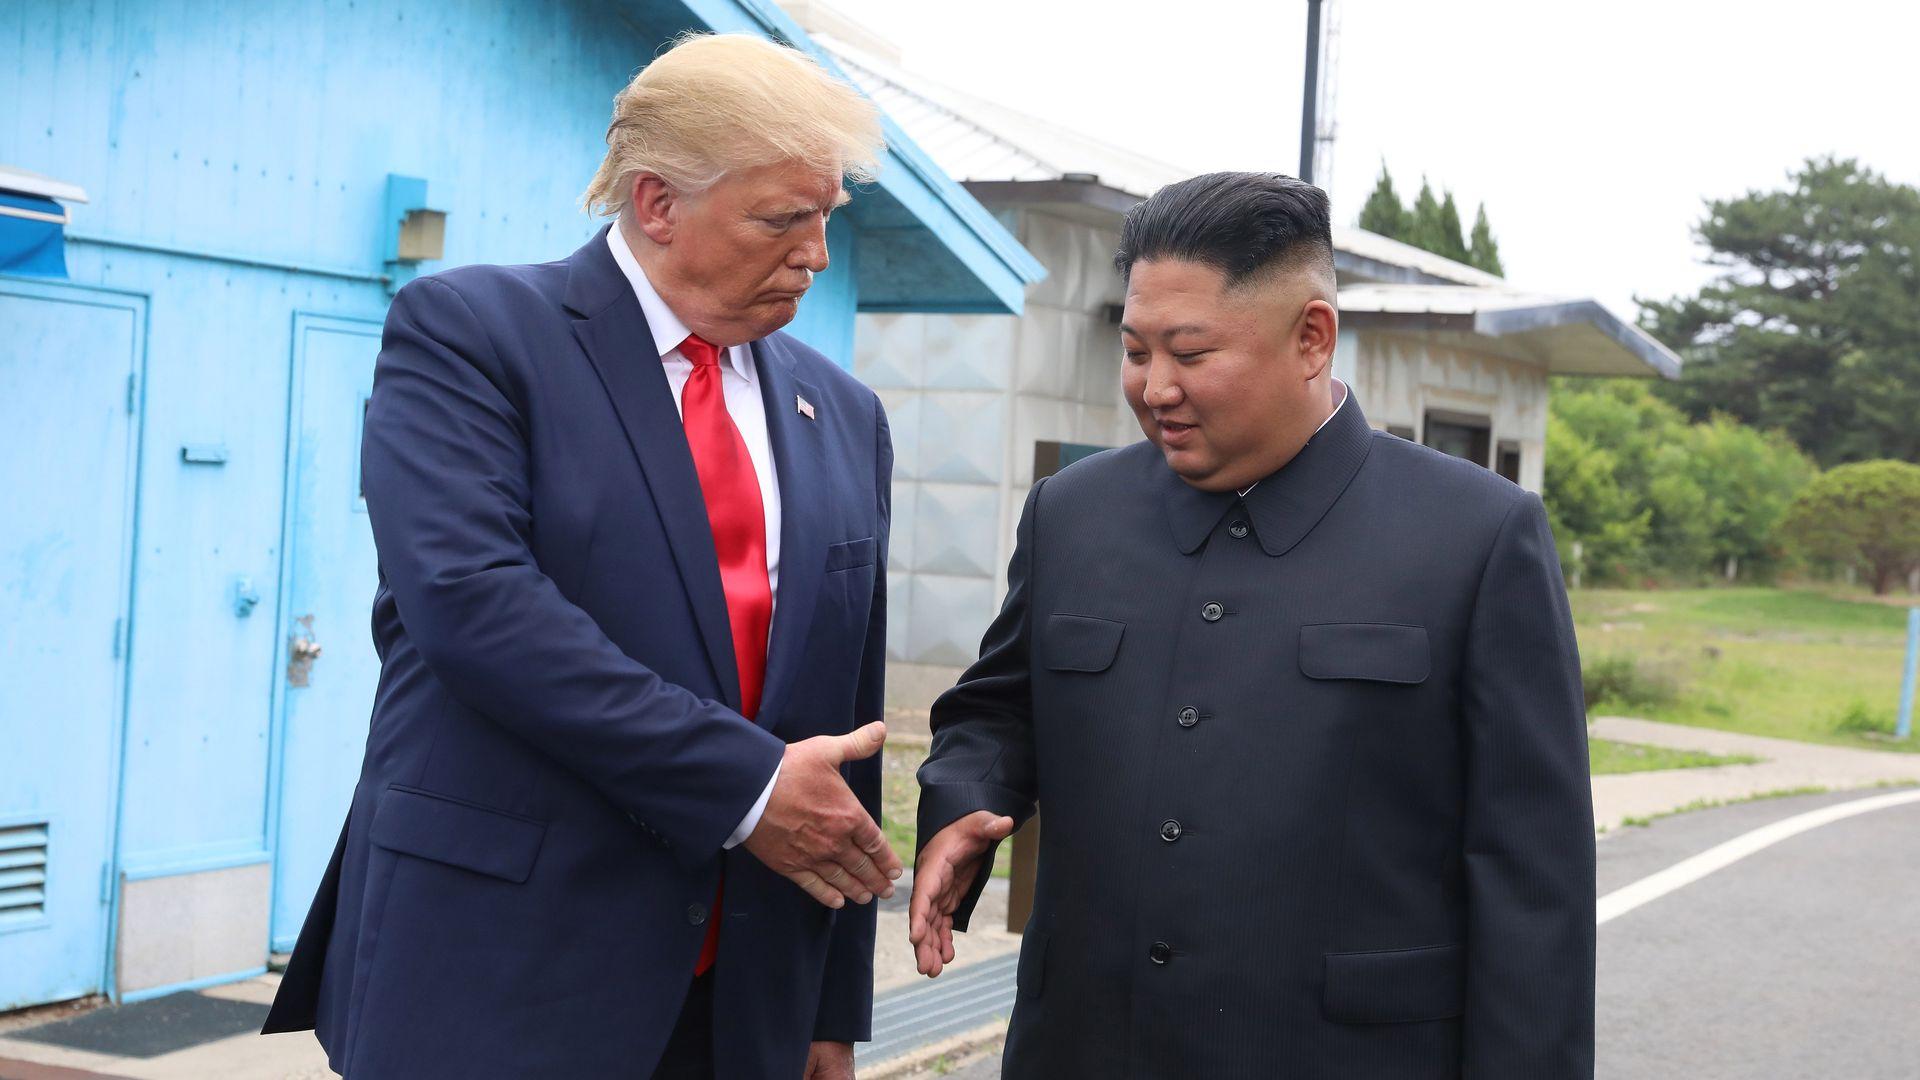 Trump shaking Kim's hand in the demilitarized zone